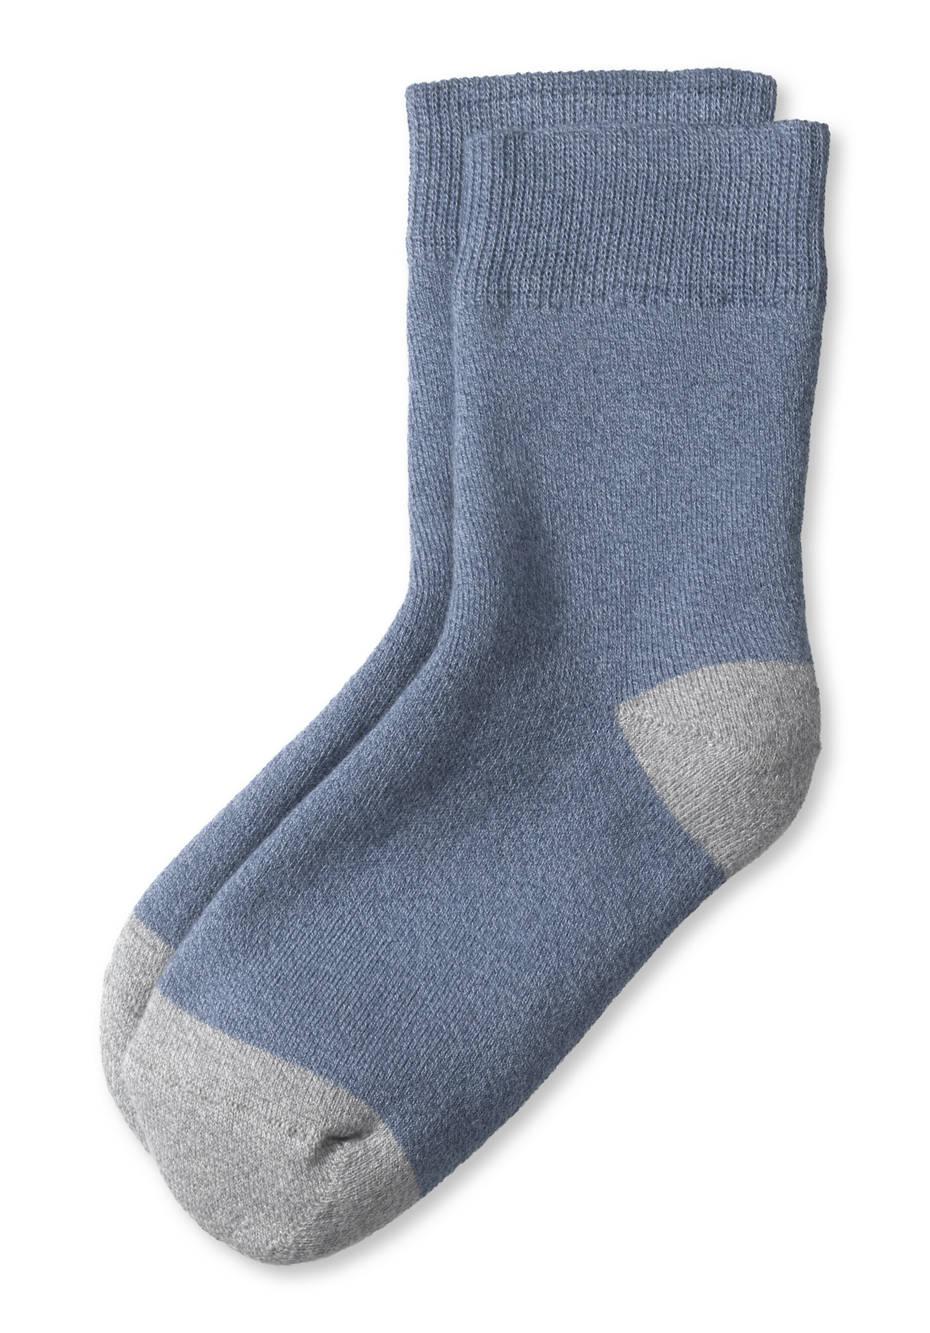 Frottee-Socke aus Bio-Baumwolle